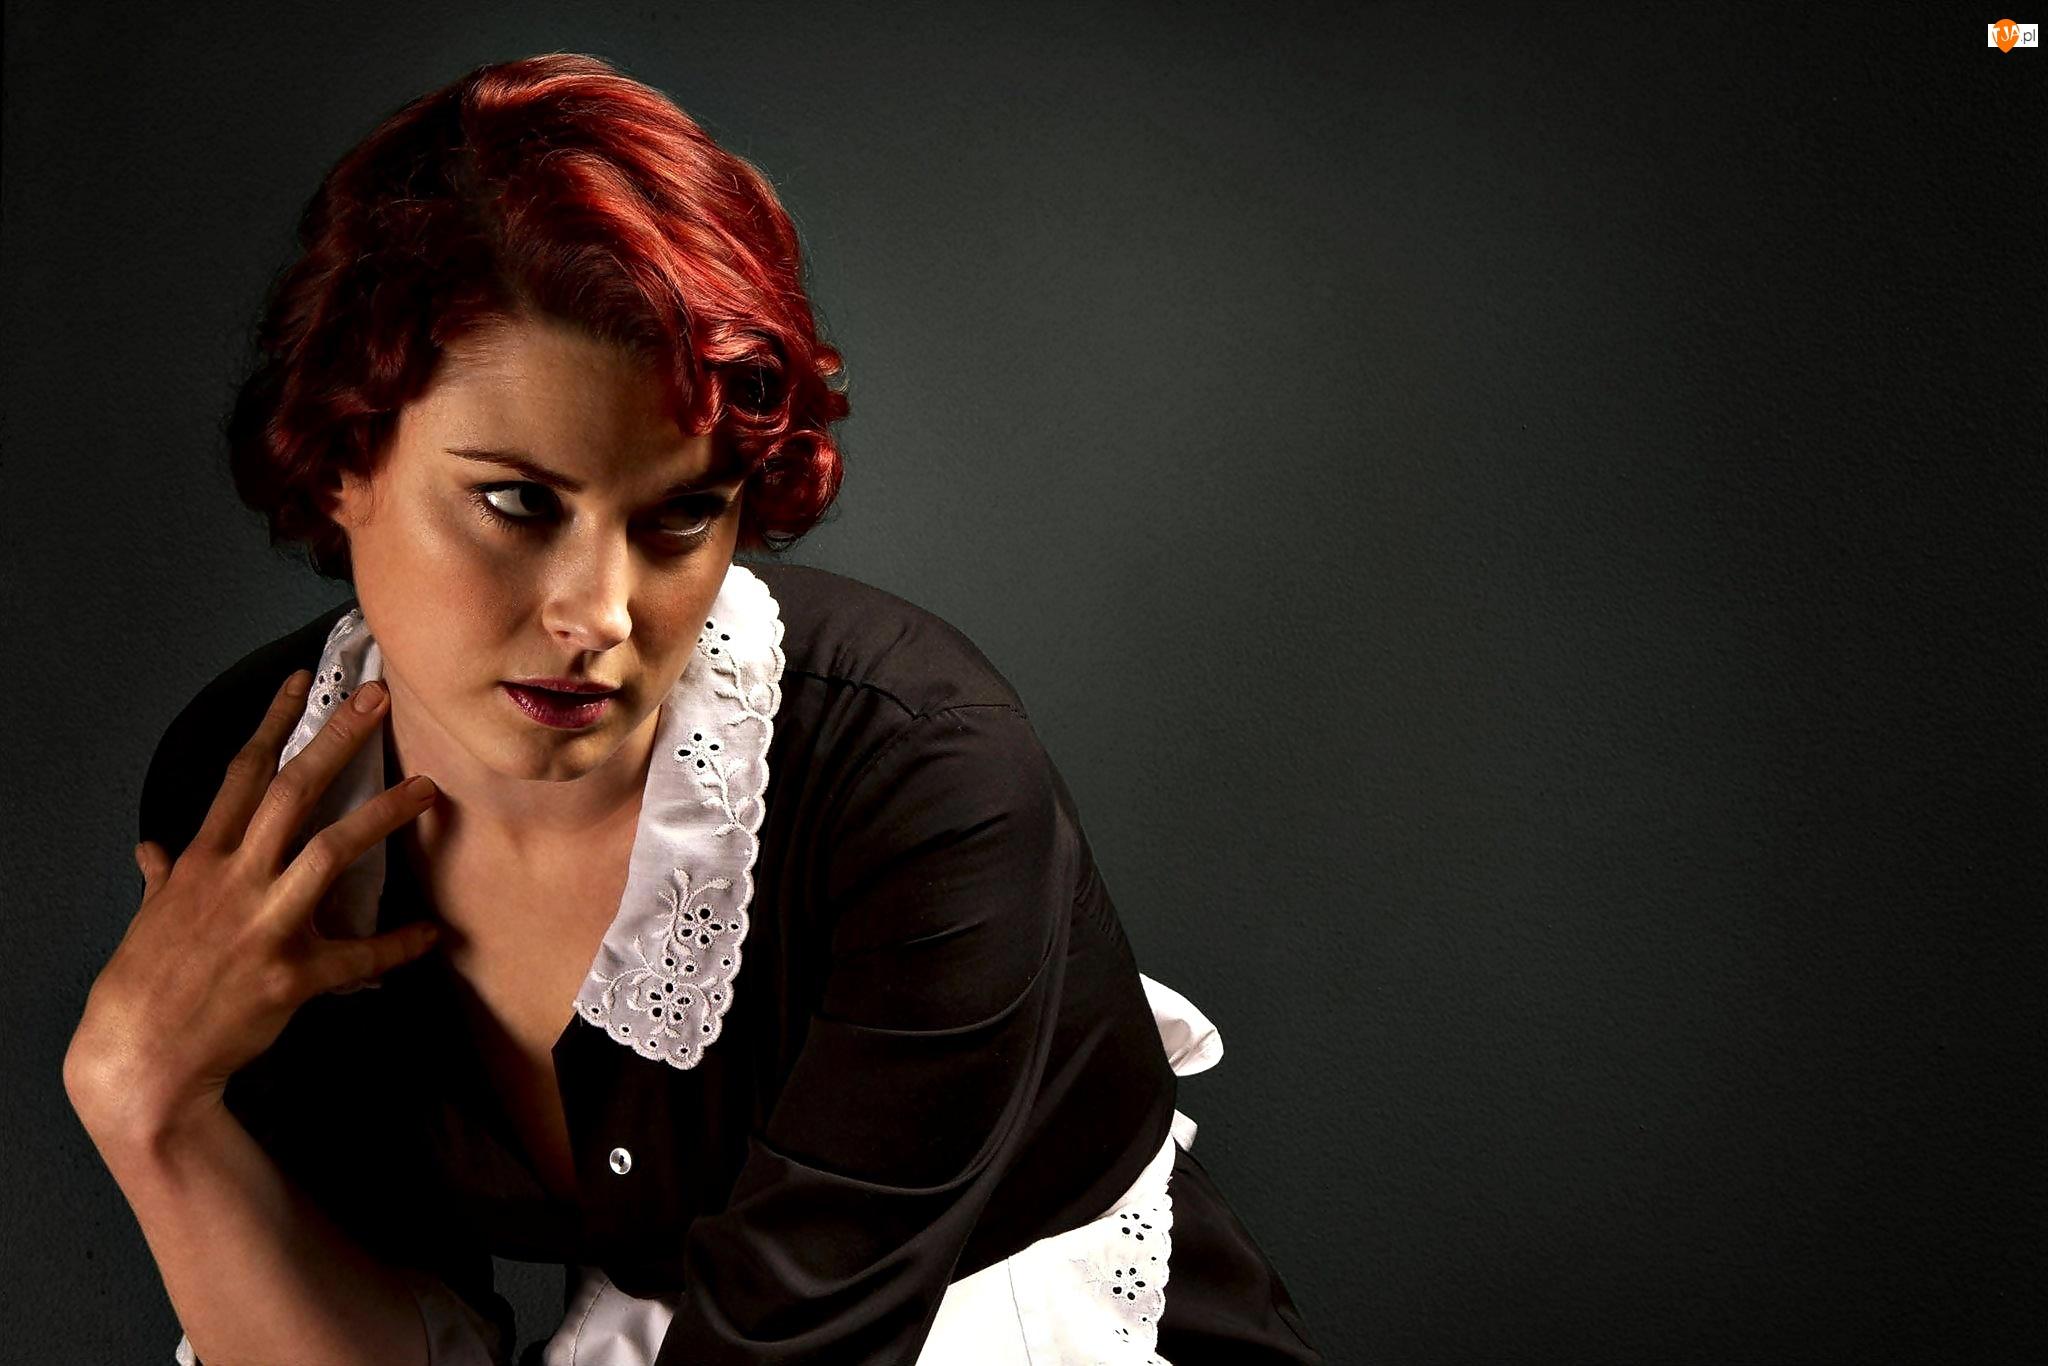 Kobieta, Serial, Aktorka, Alexandra Breckenridge, Fartuszek, American Horror Story, Gosposia